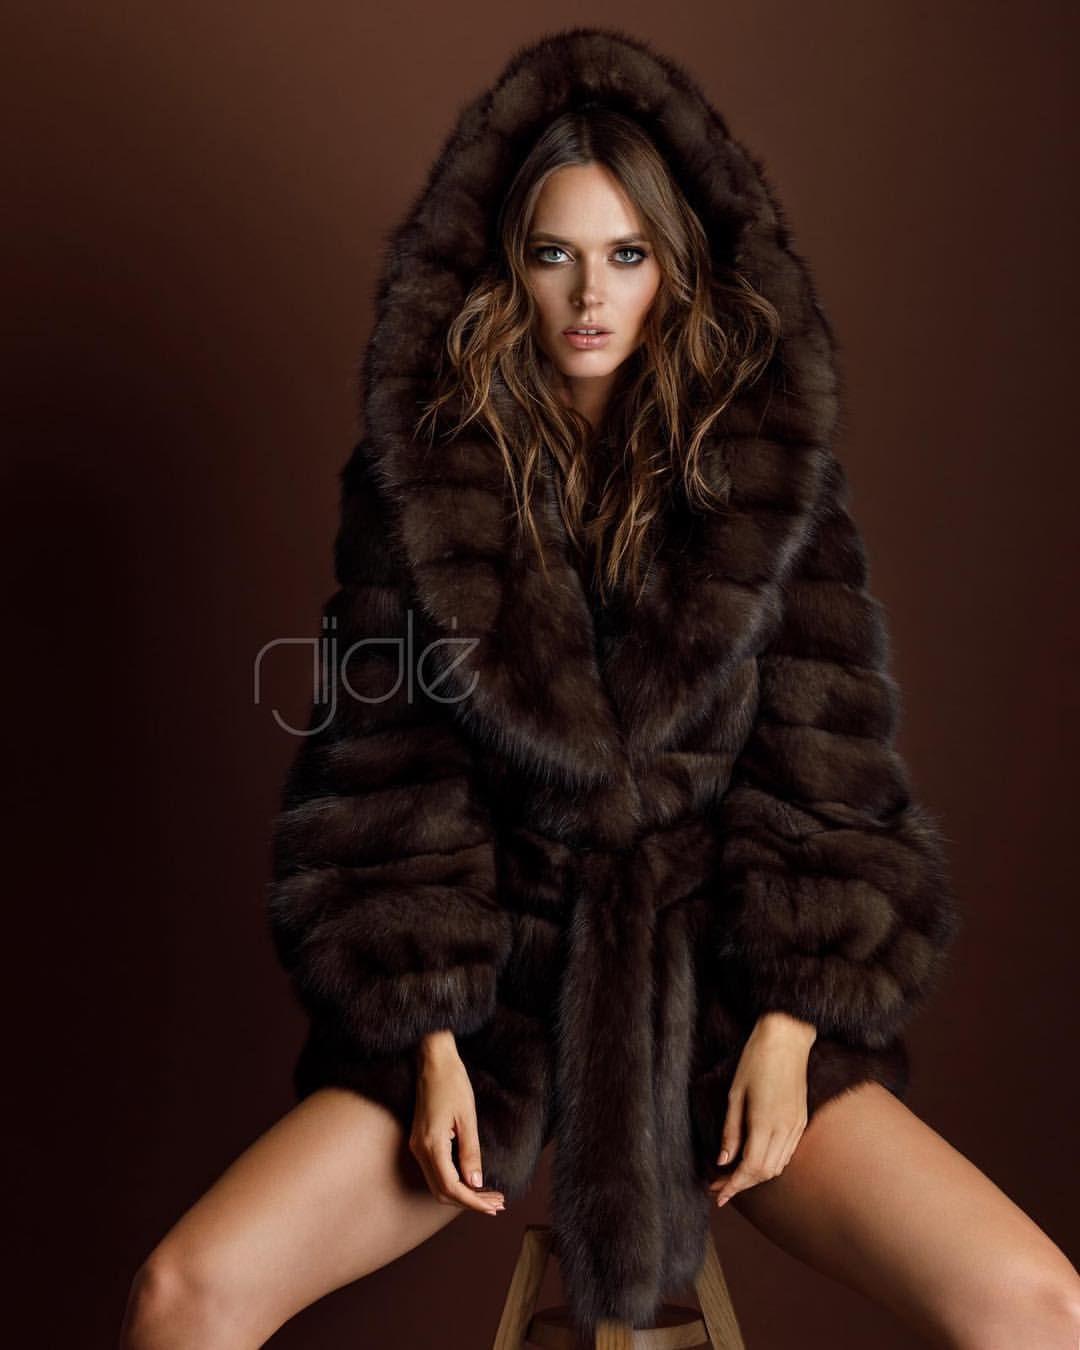 3c86b873264 Queen of furs 👑 Nijole #nijolefurs#realfurs#fashionfurs #соболь# monmonaco#